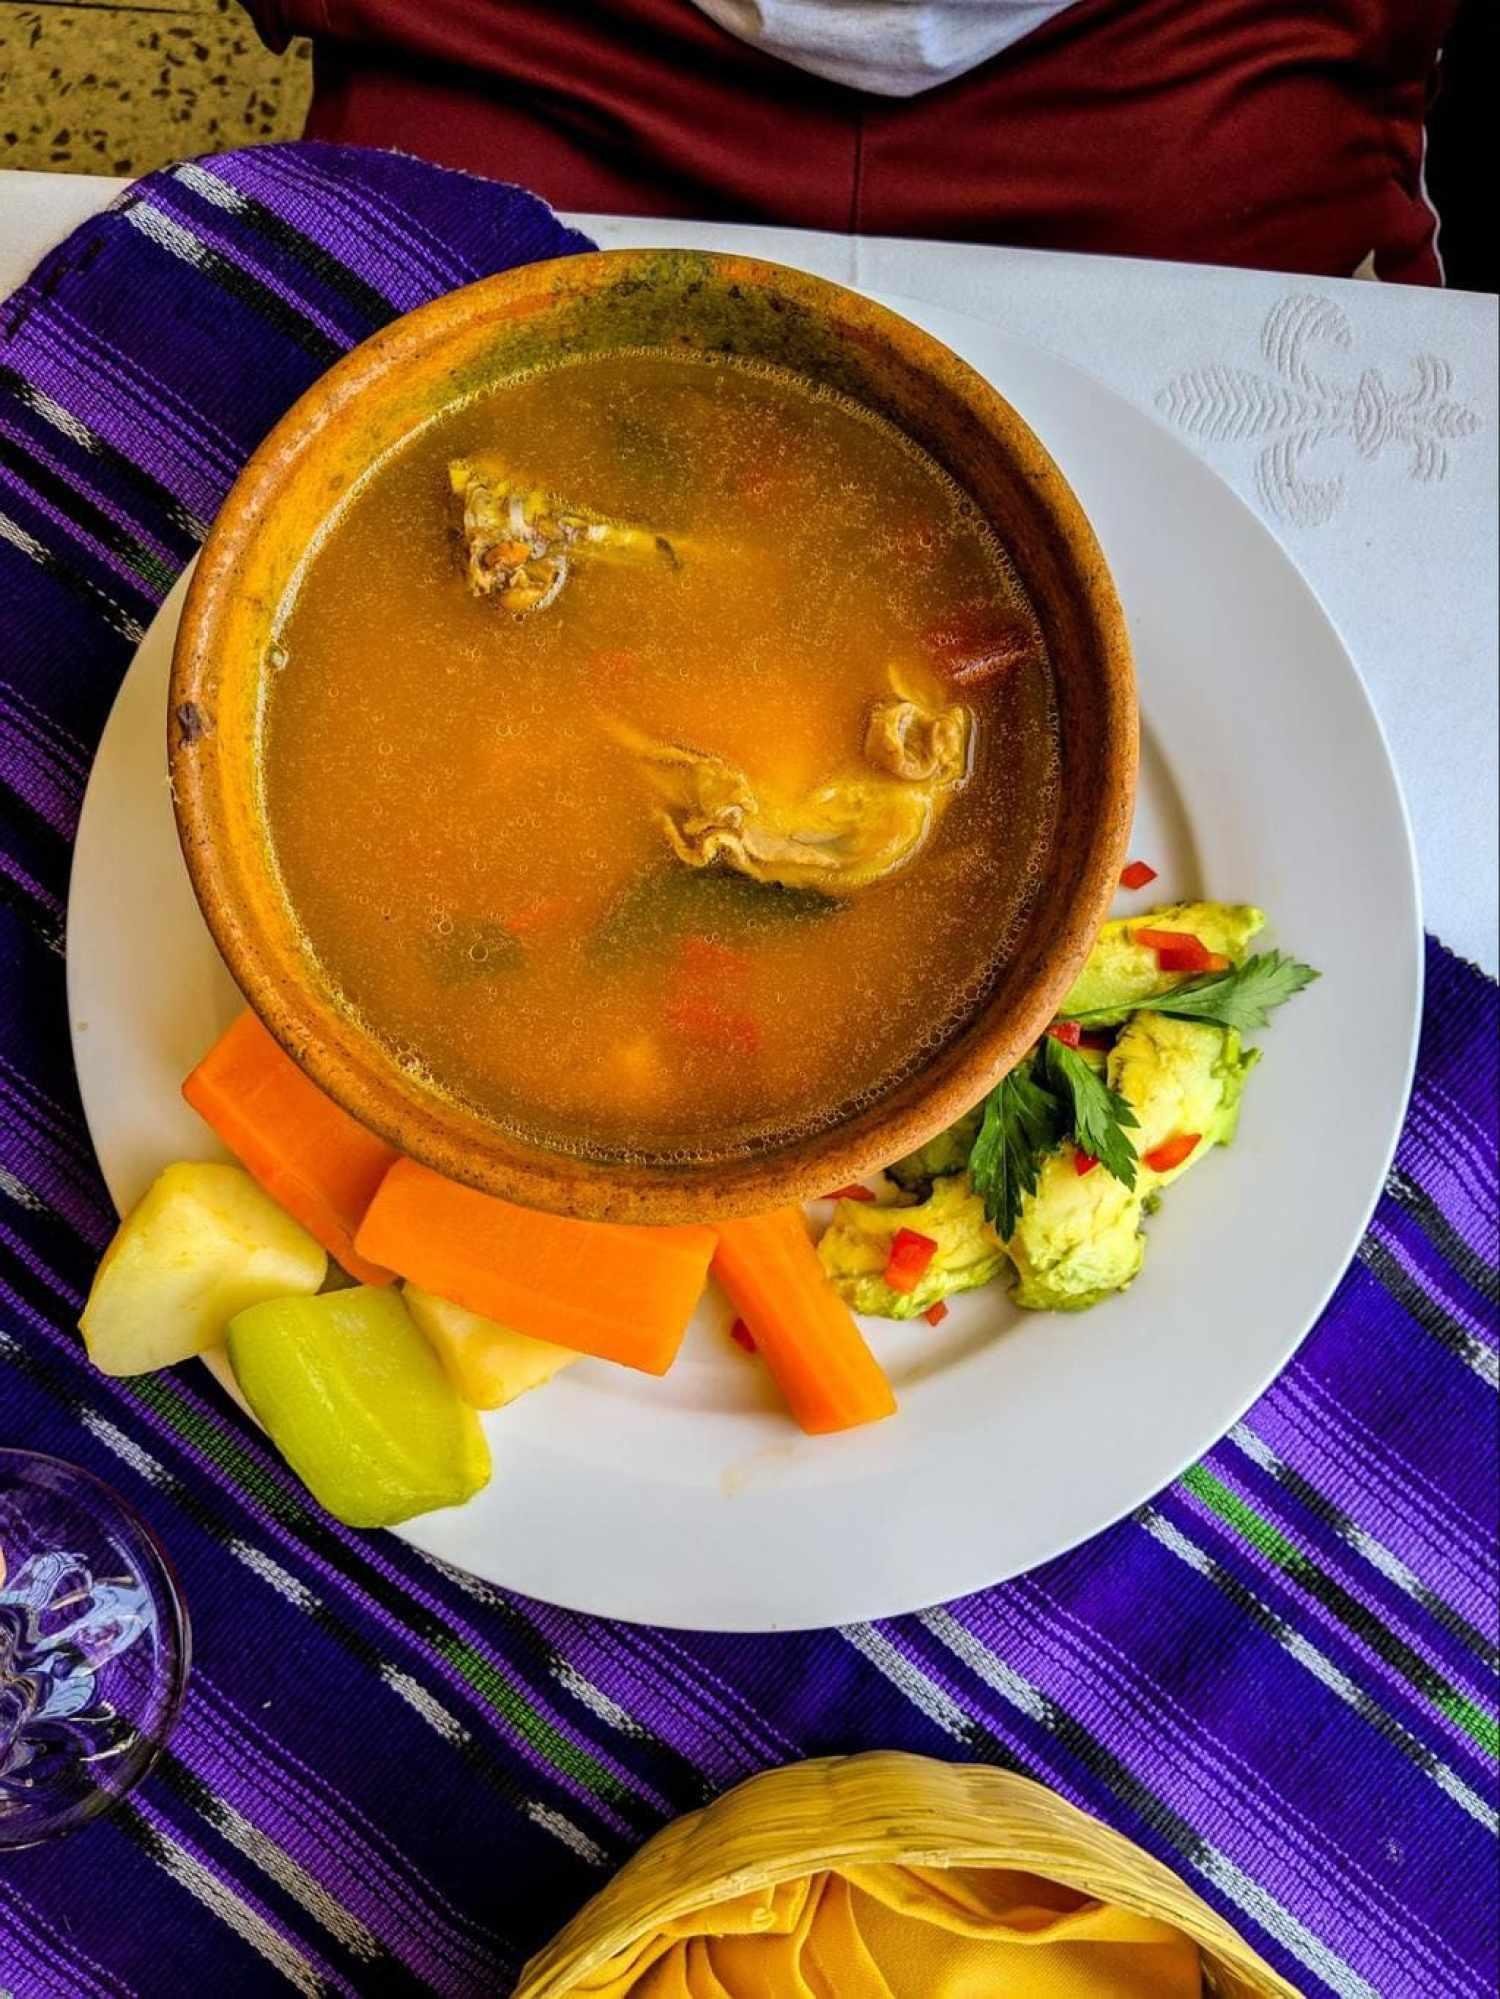 Kak'ik is another Mayan dish